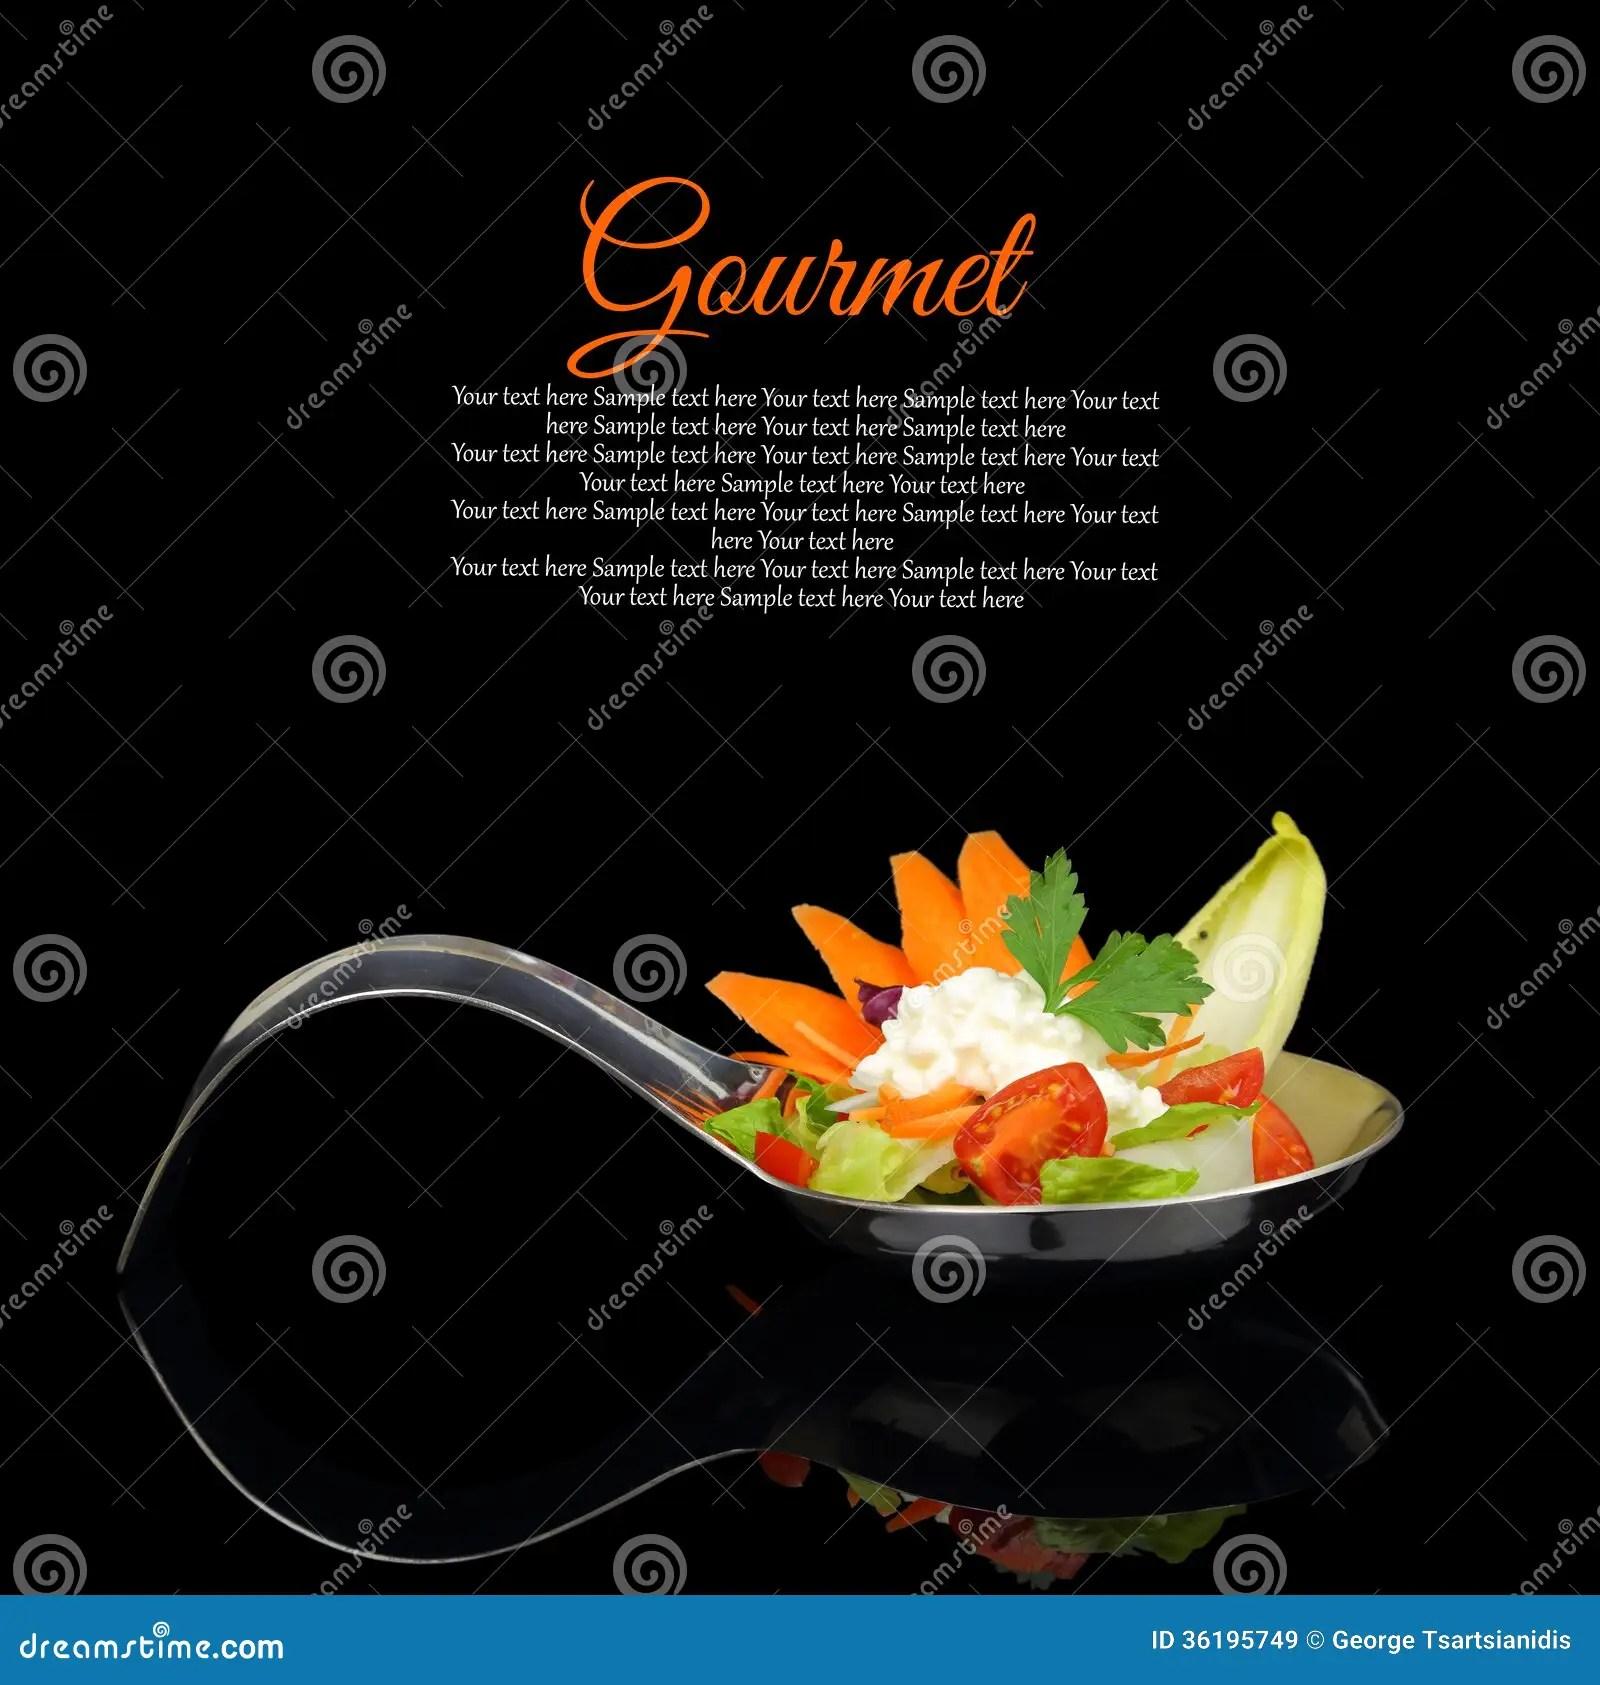 Gourmet food stock image Image of cuisine black